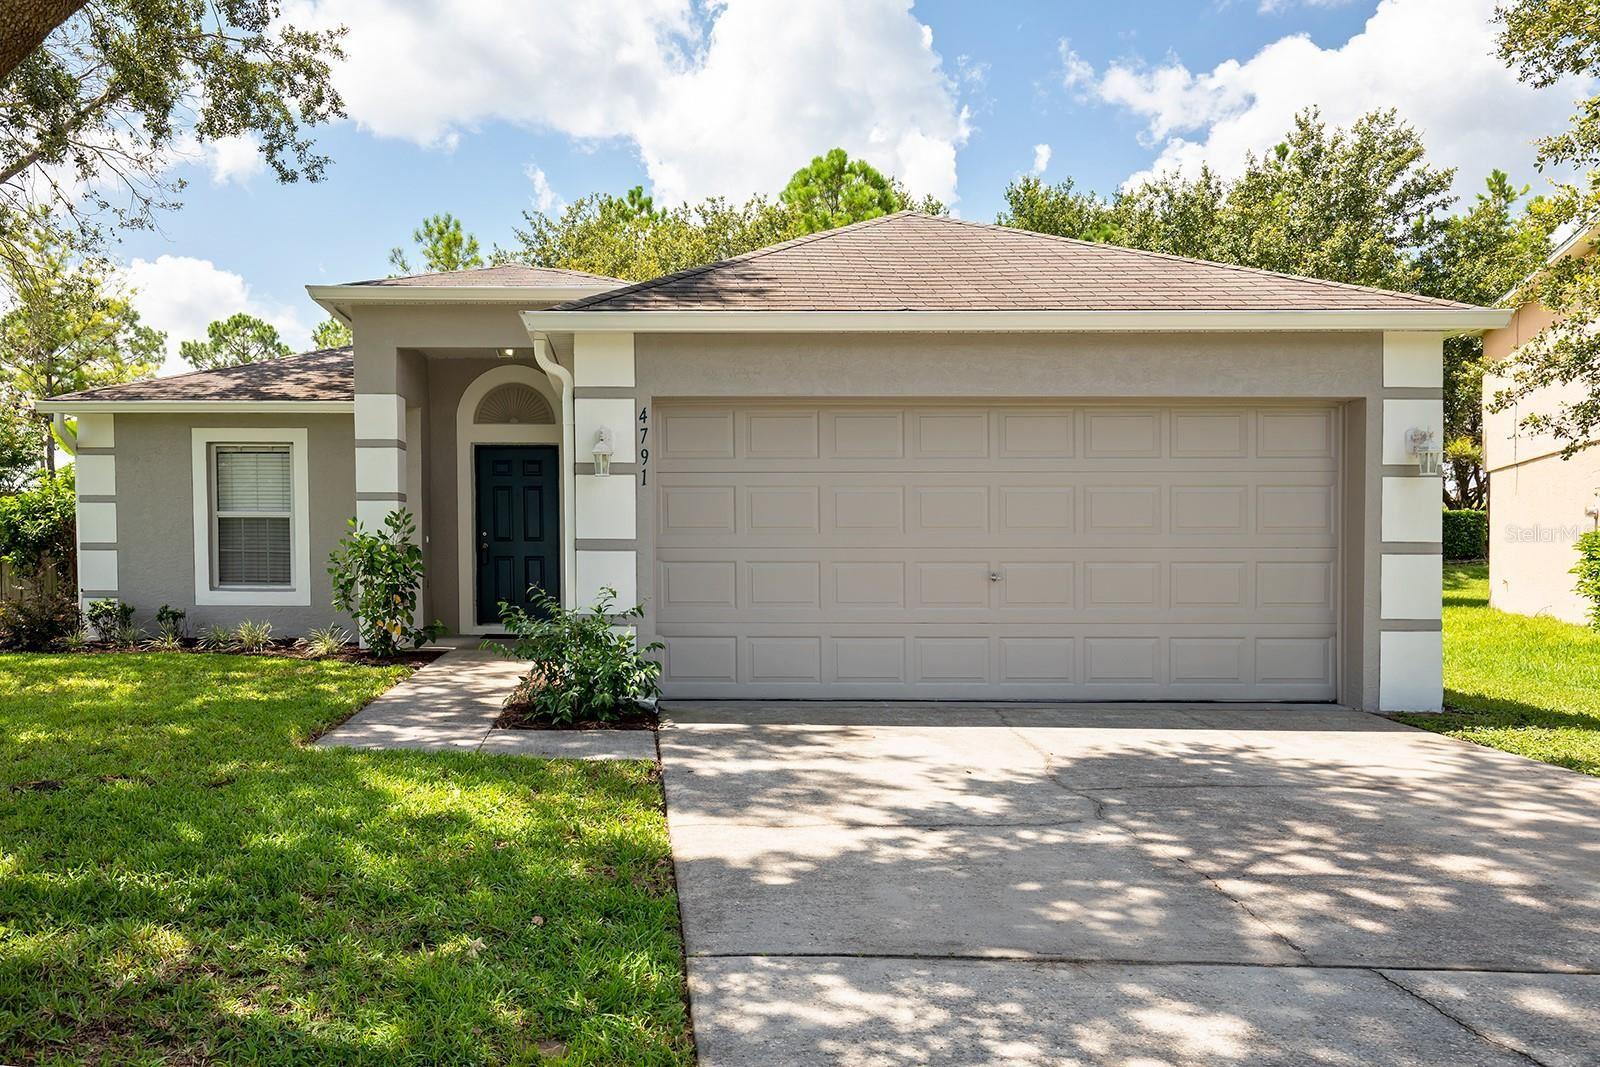 4791 WILLAMETTE CIRCLE, Orlando, FL 32826 - MLS#: O5956718